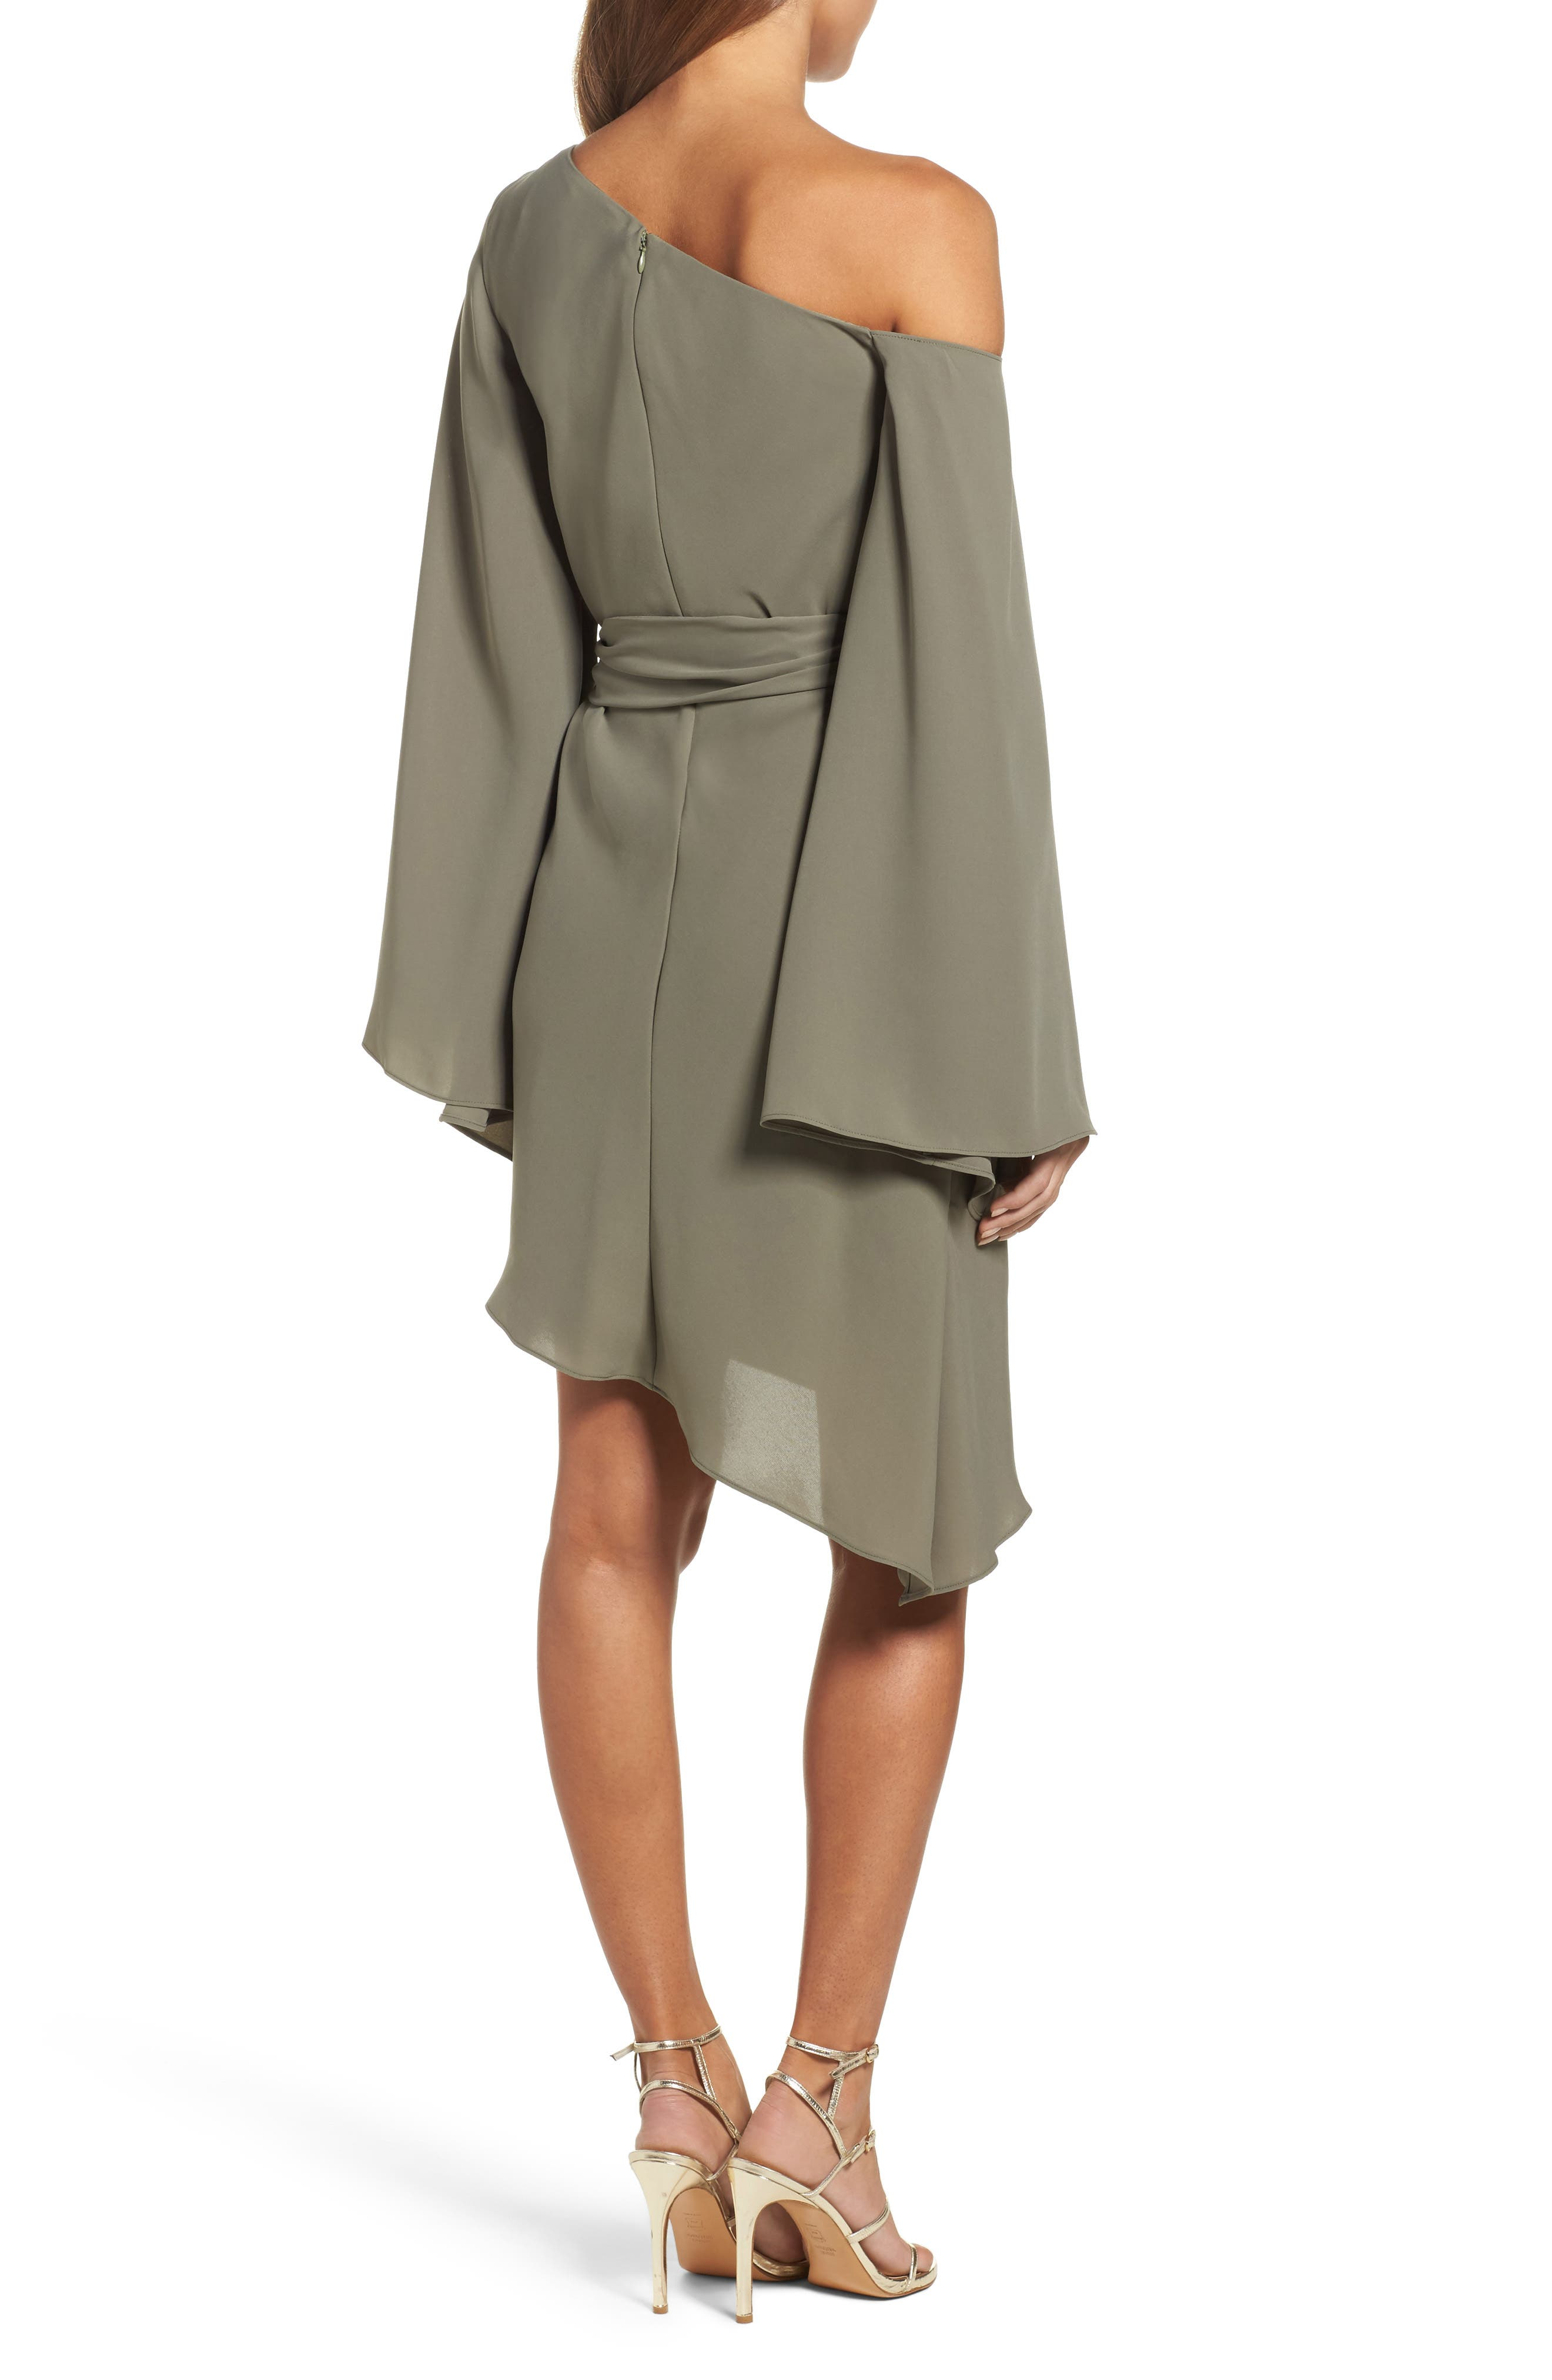 Beyond Me One-Shoulder Dress,                             Alternate thumbnail 3, color,                             Khaki